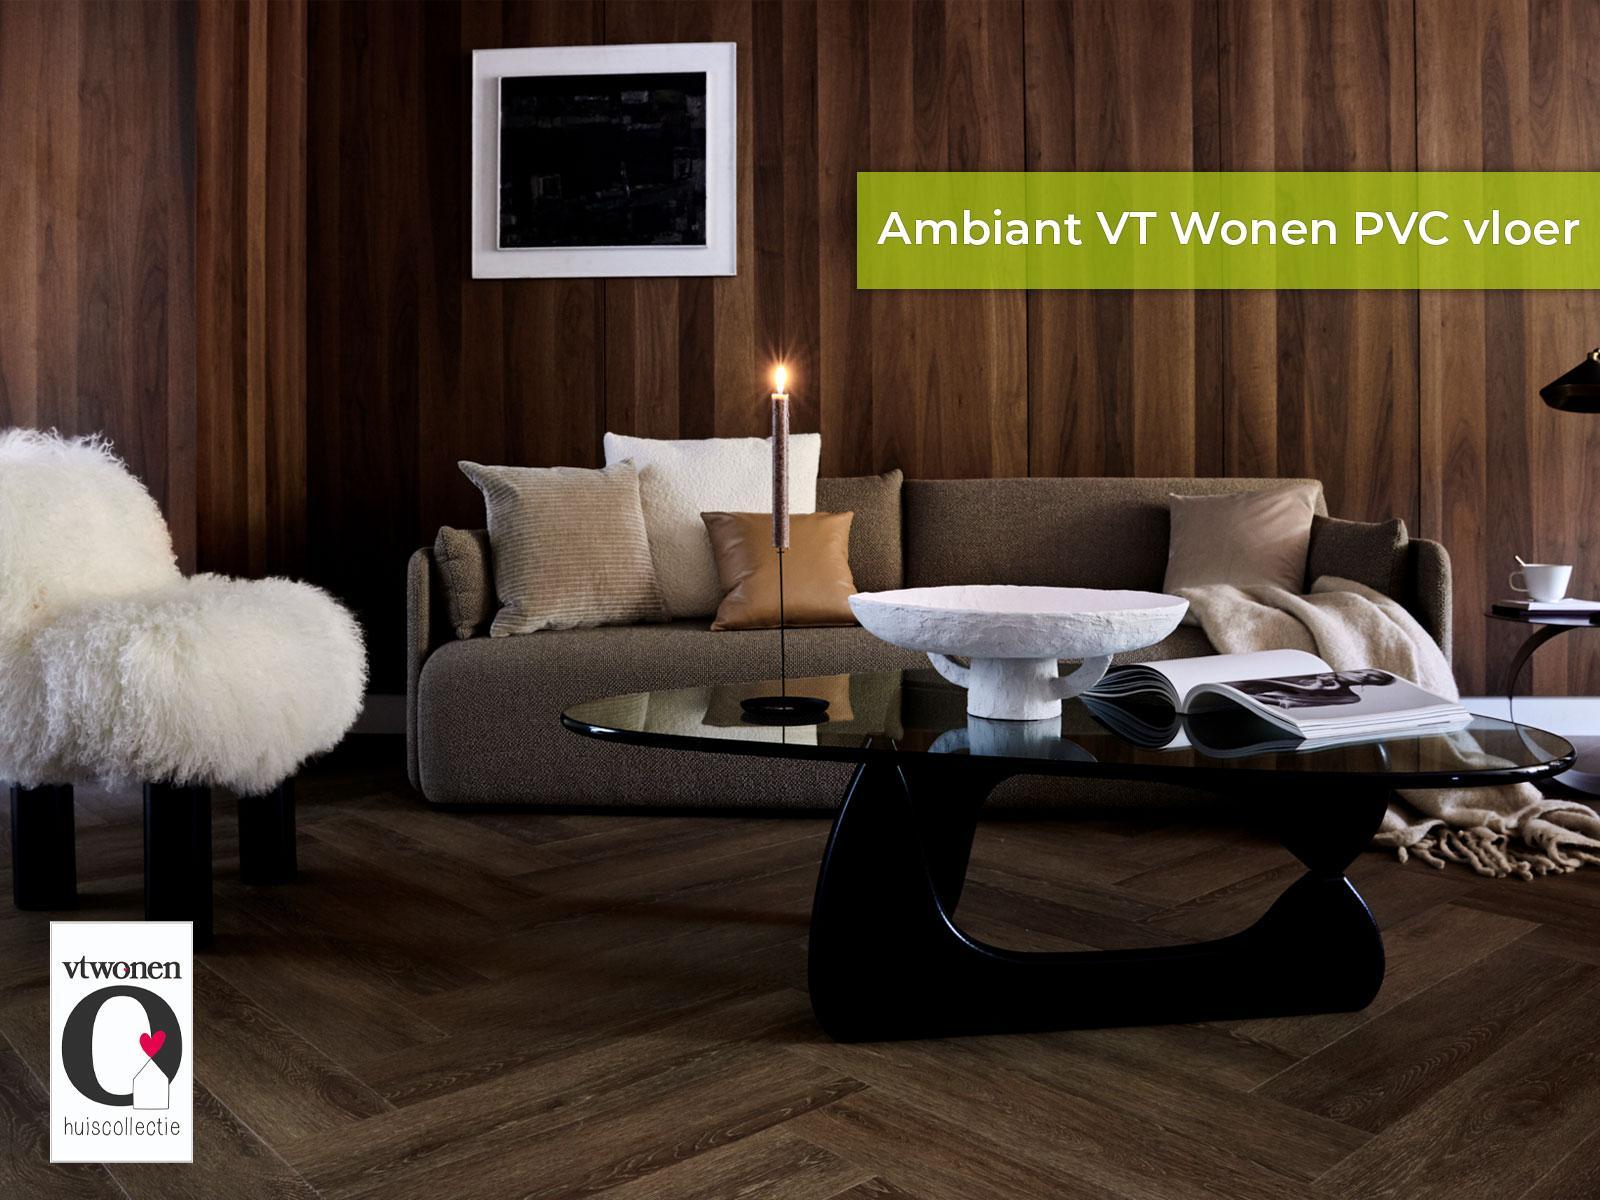 Ambiant VT Wonen PVC vloer